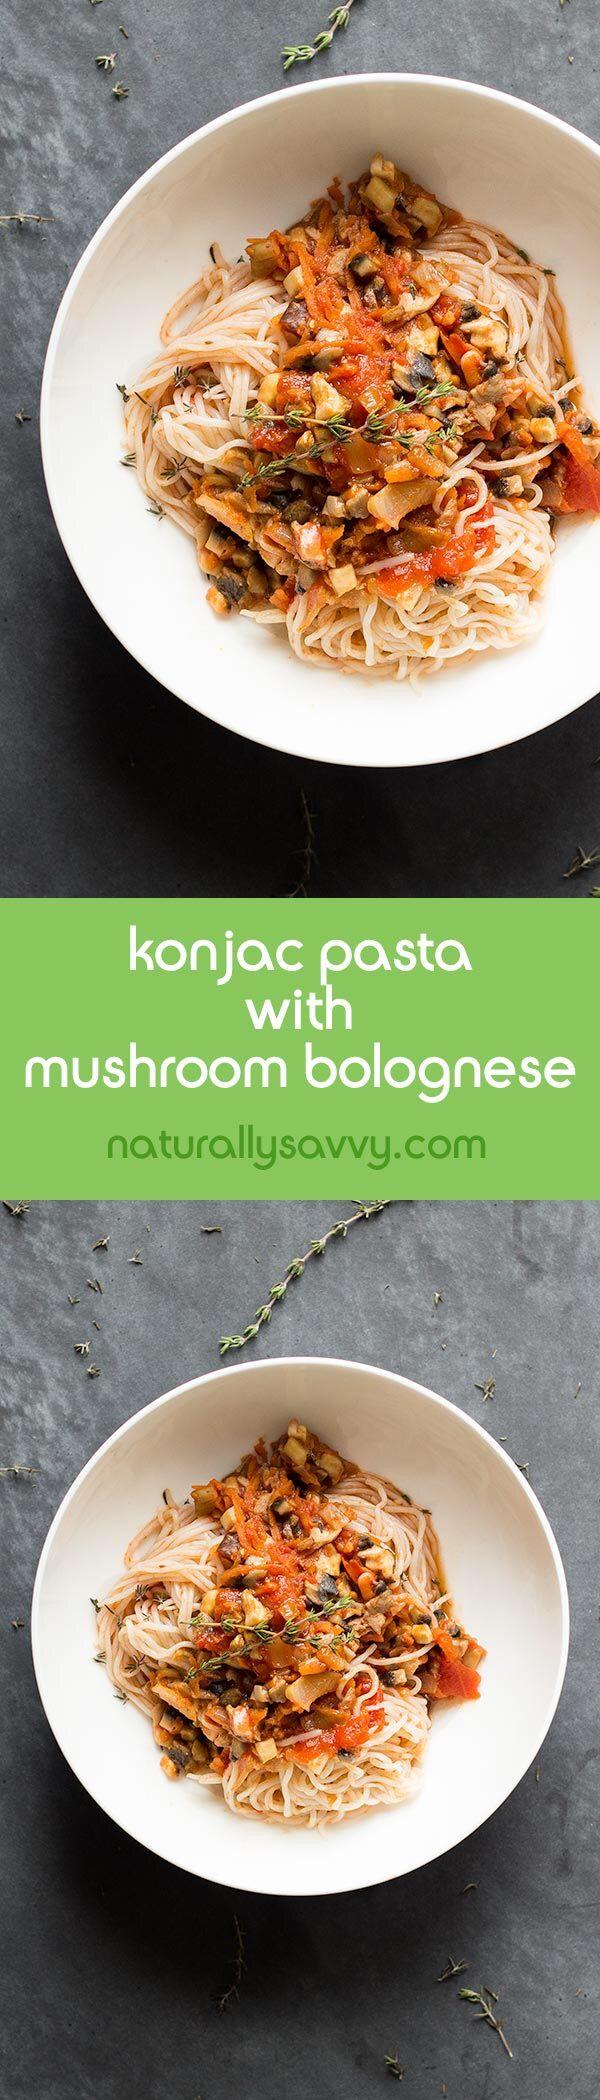 Konjac pasta with mushroom bolognese!